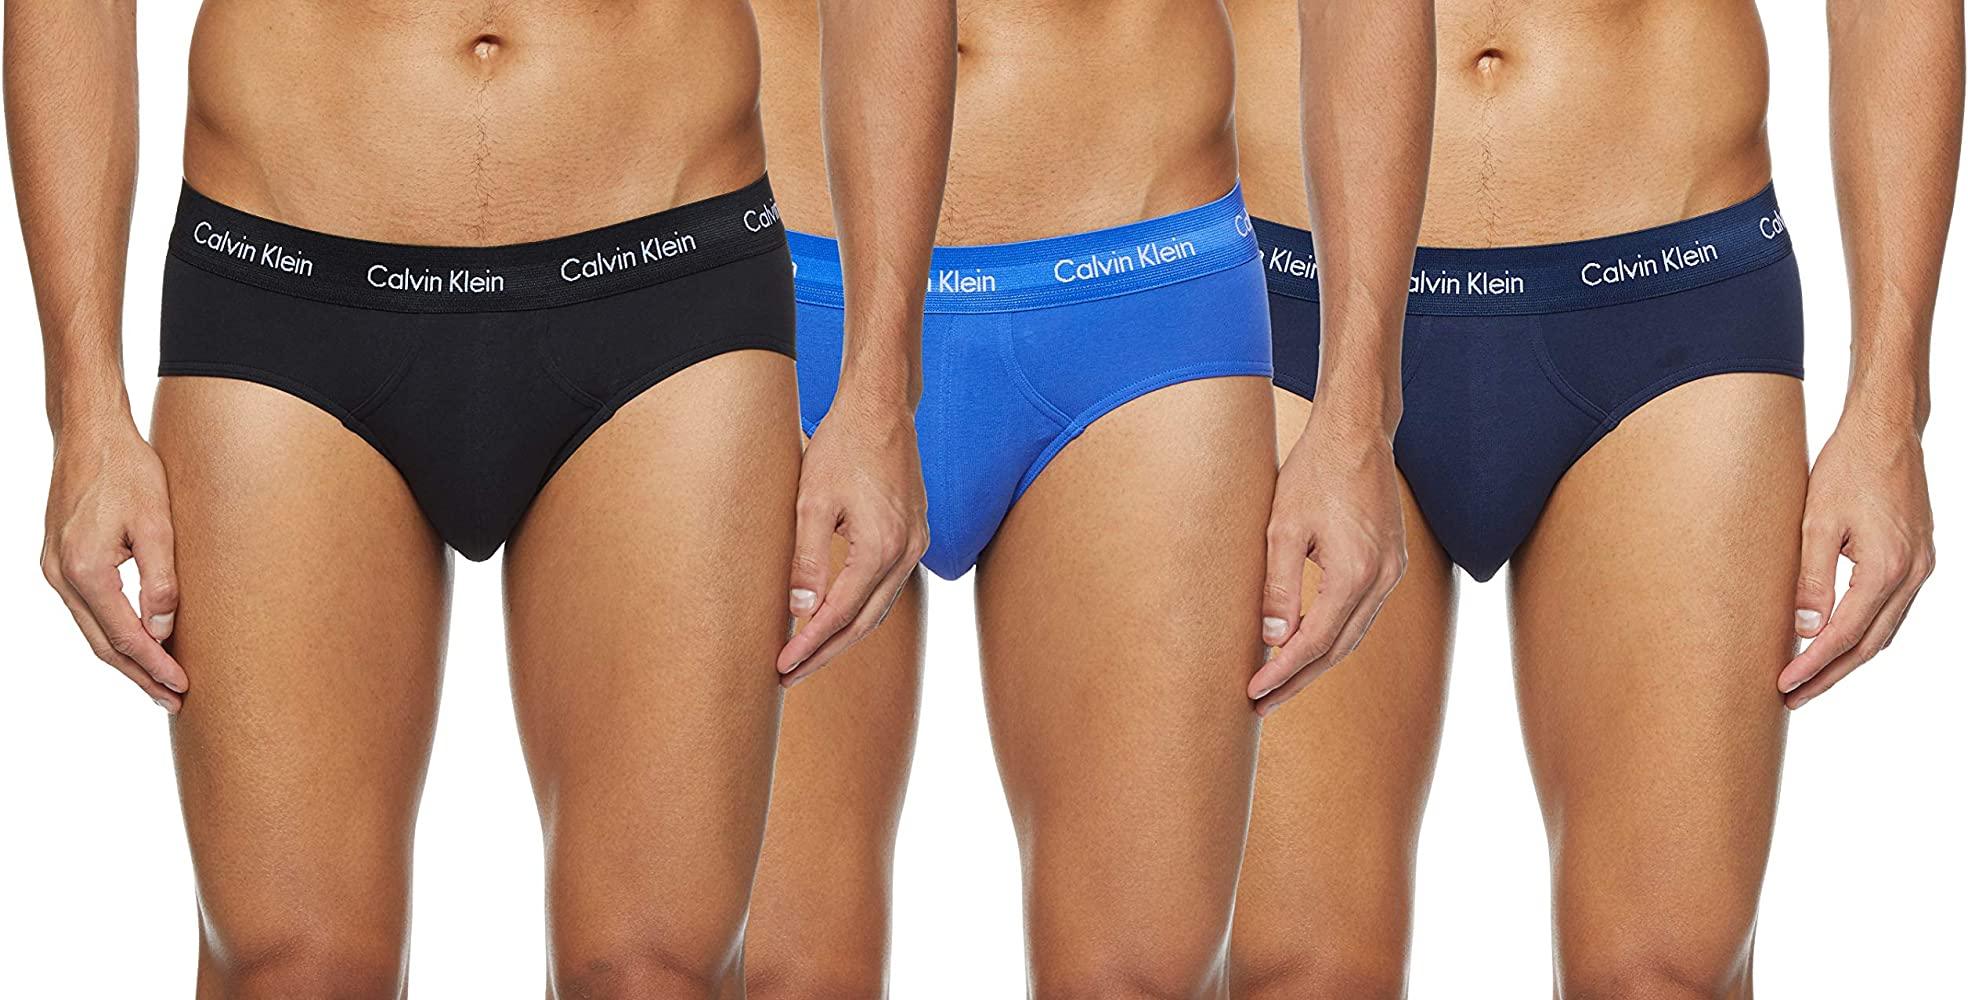 Calvin Klein Cotton Stretch-3er Pantalones térmicos, Azul (Black/Blue Shadow/Cobalt Water DTM WB 4ku), X-Small (Pack de 3) para Hombre: Amazon.es: Ropa y accesorios